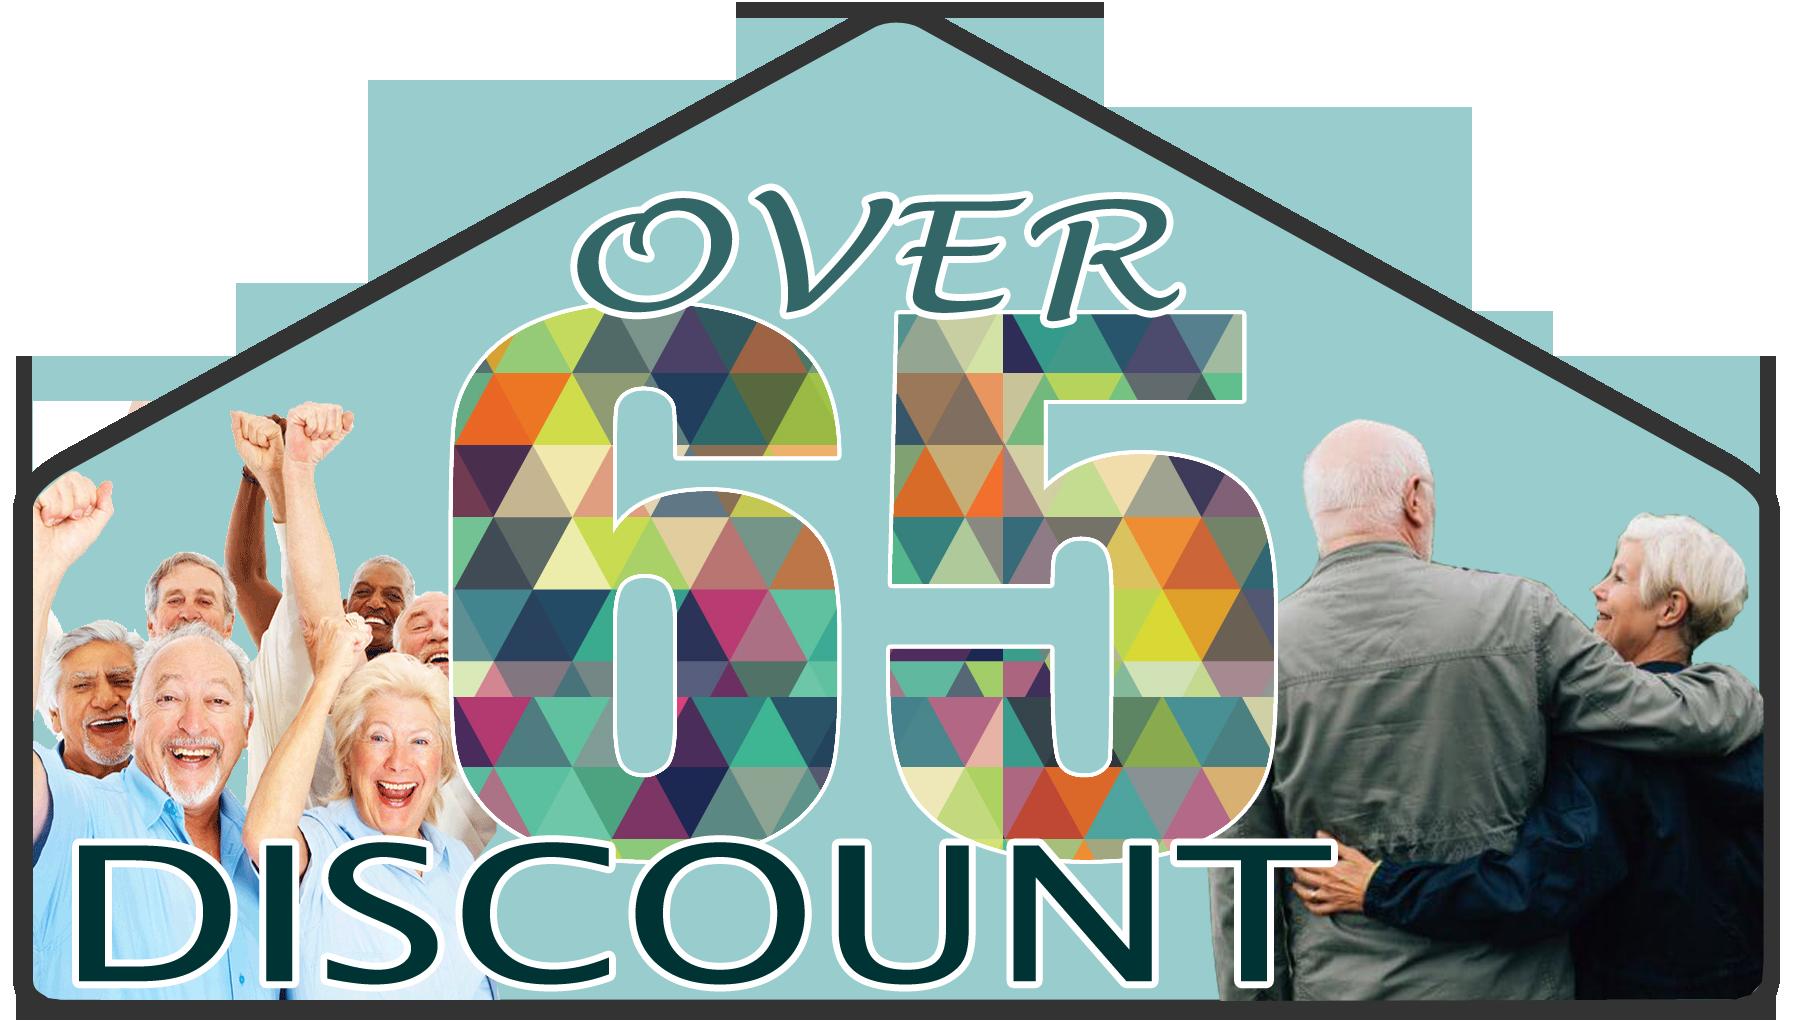 DISCOUNT-over65